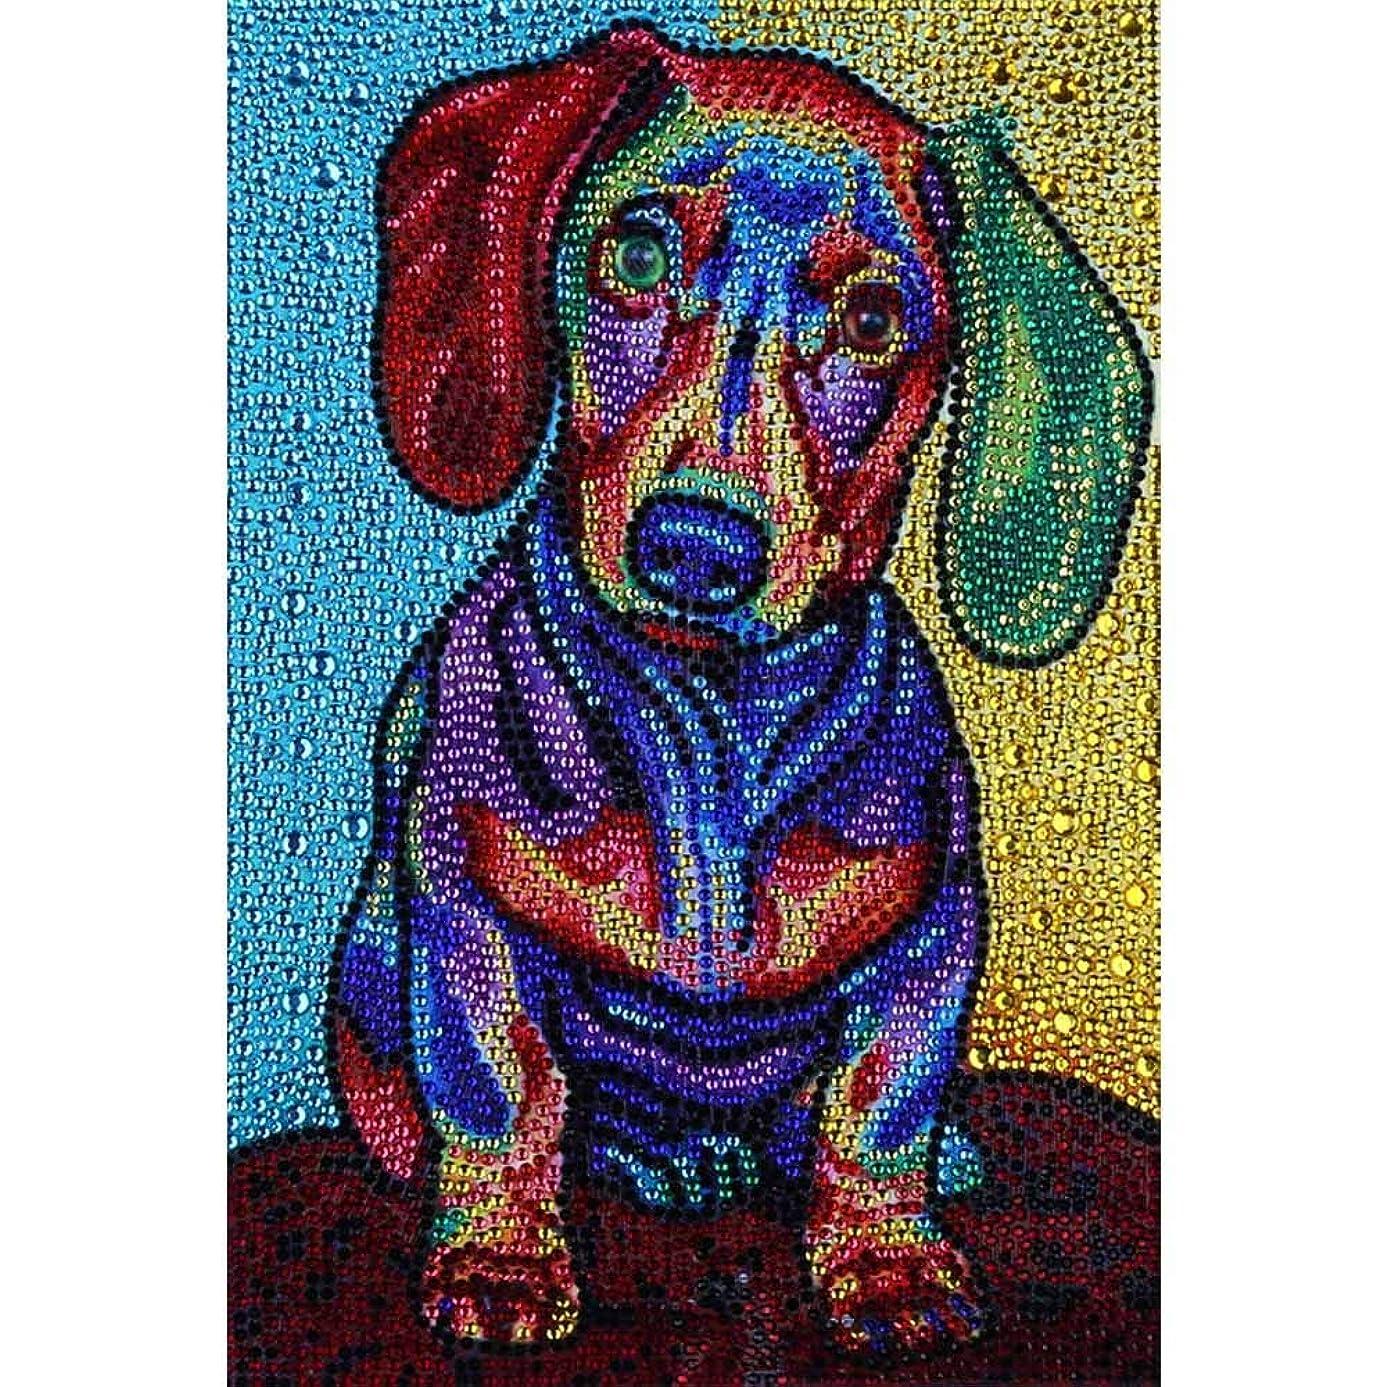 VVEEWUU 5D Diamond Pianting by Number Kits Full Drill Rhinestone Mosaic Making for Home Wall Decor (Dog)